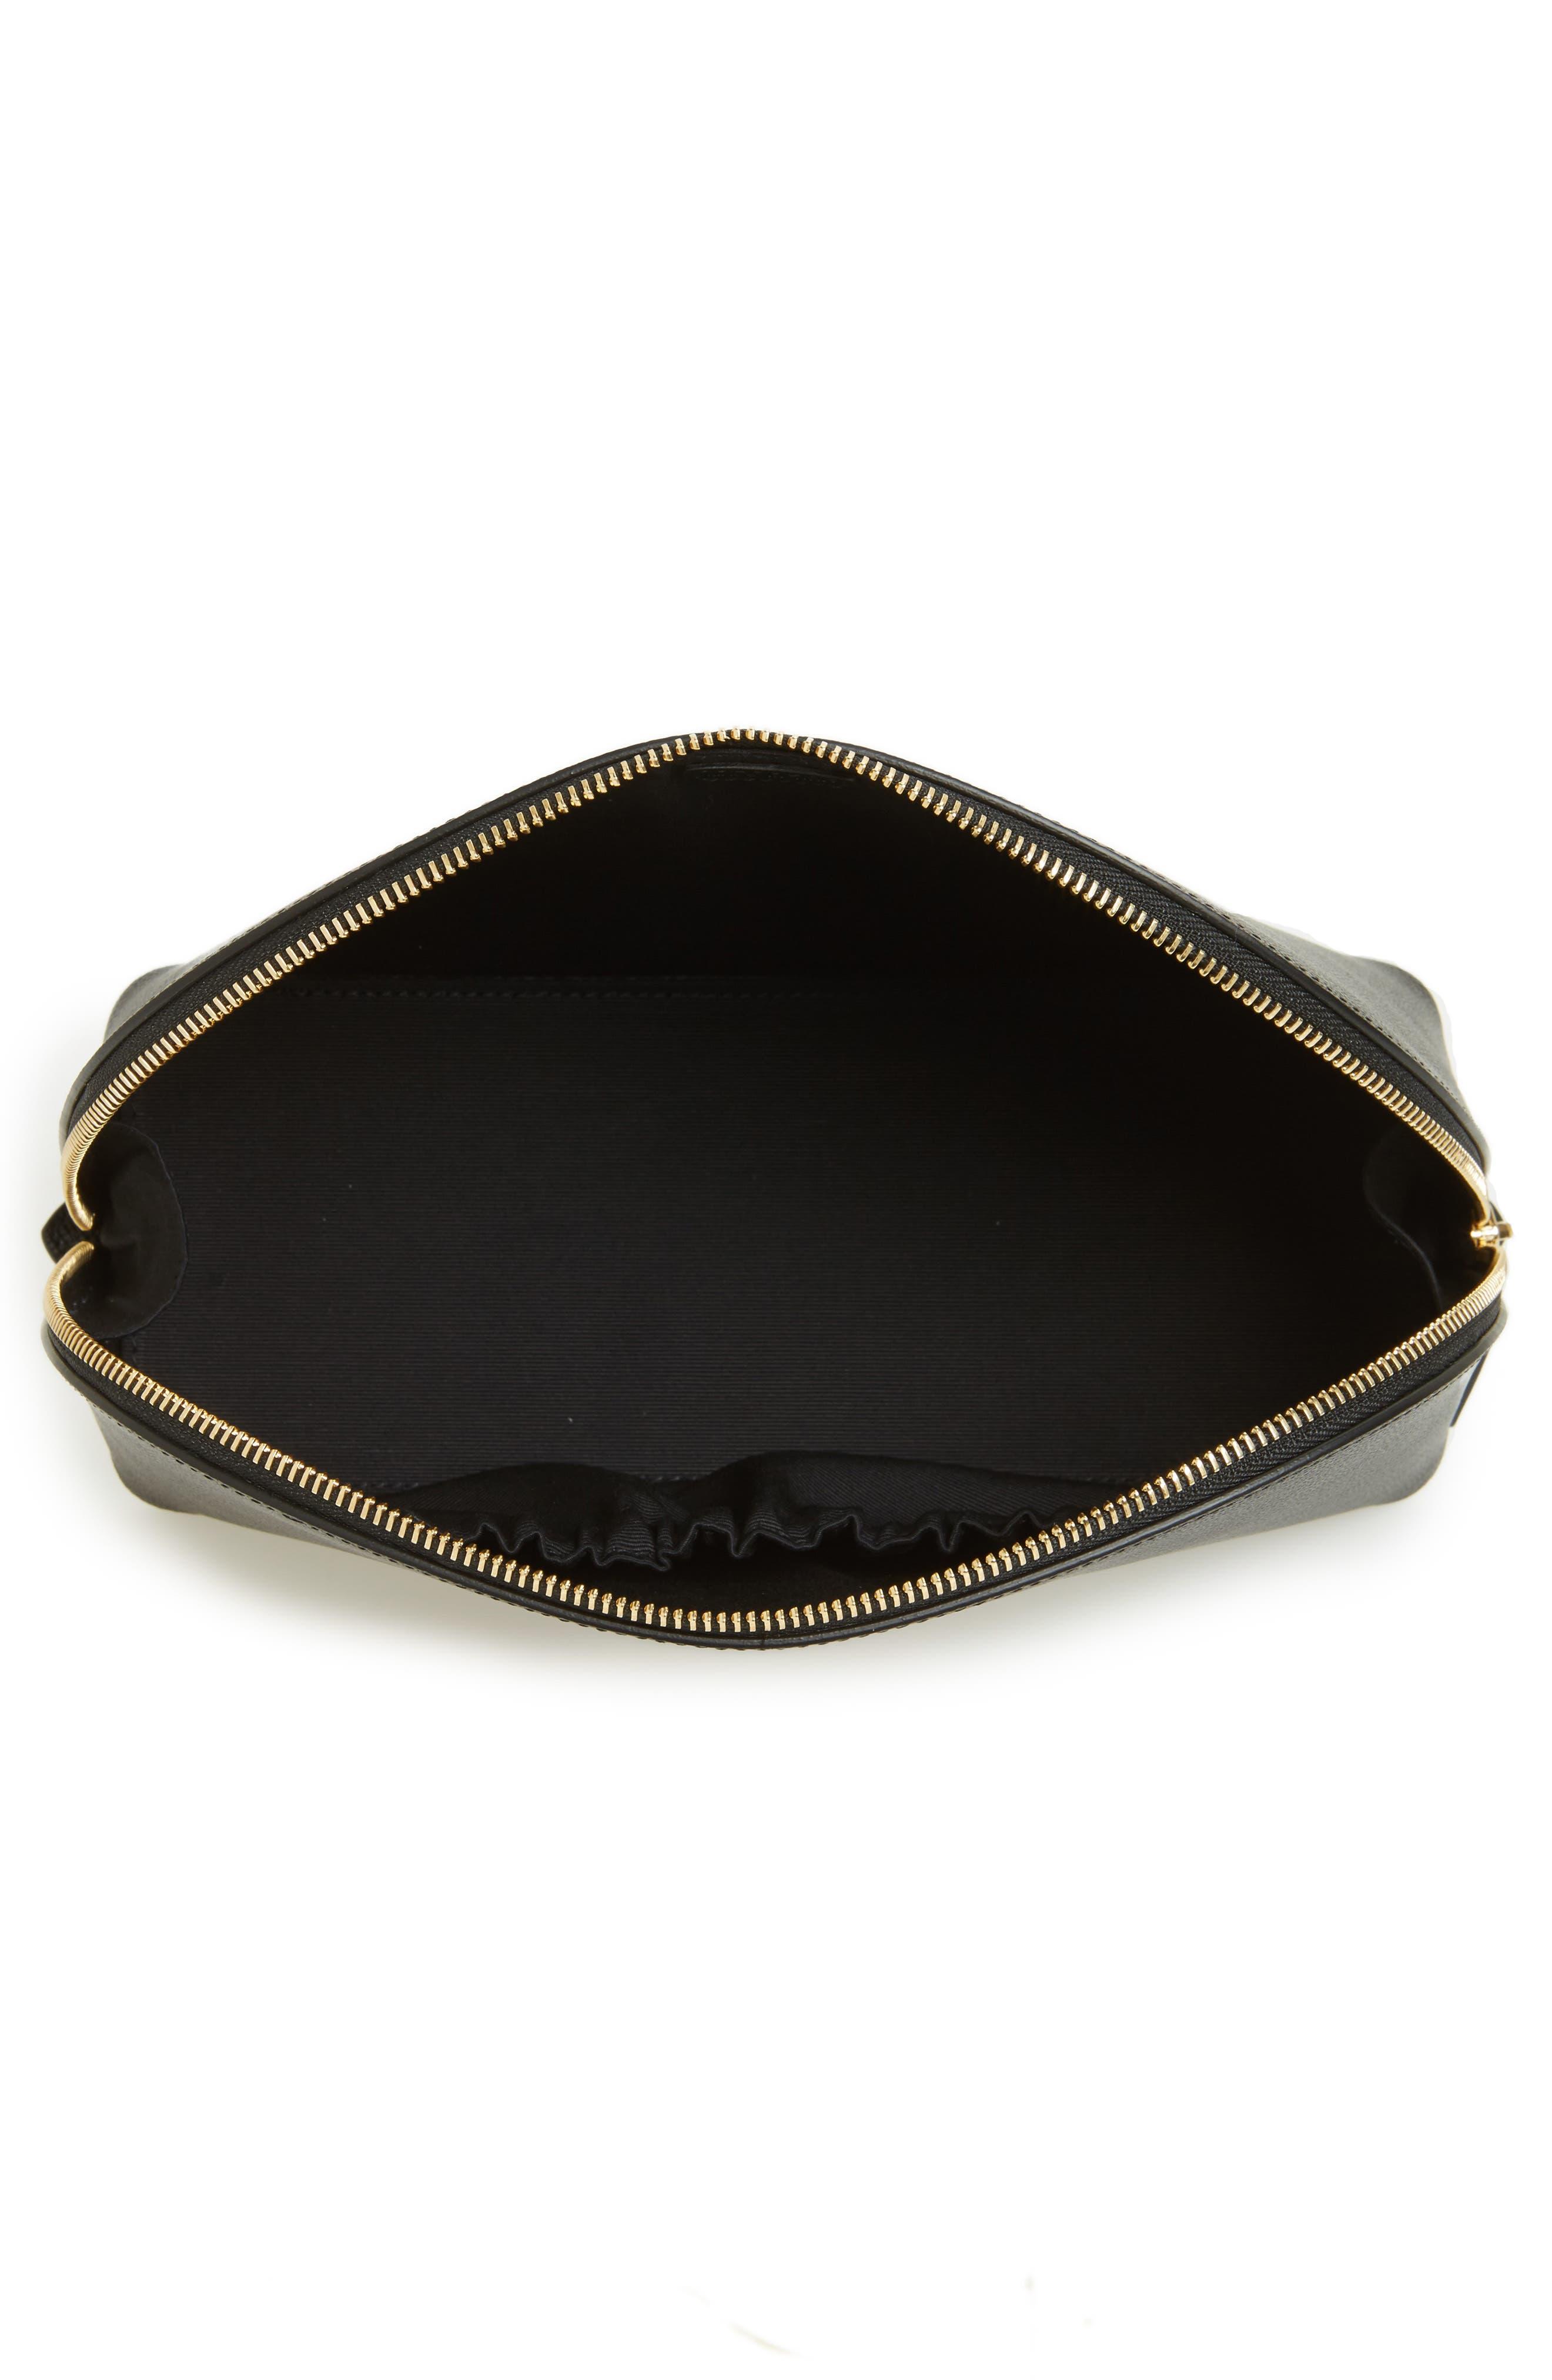 Medium Leather Cosmetics Bag,                             Alternate thumbnail 4, color,                             BLACK